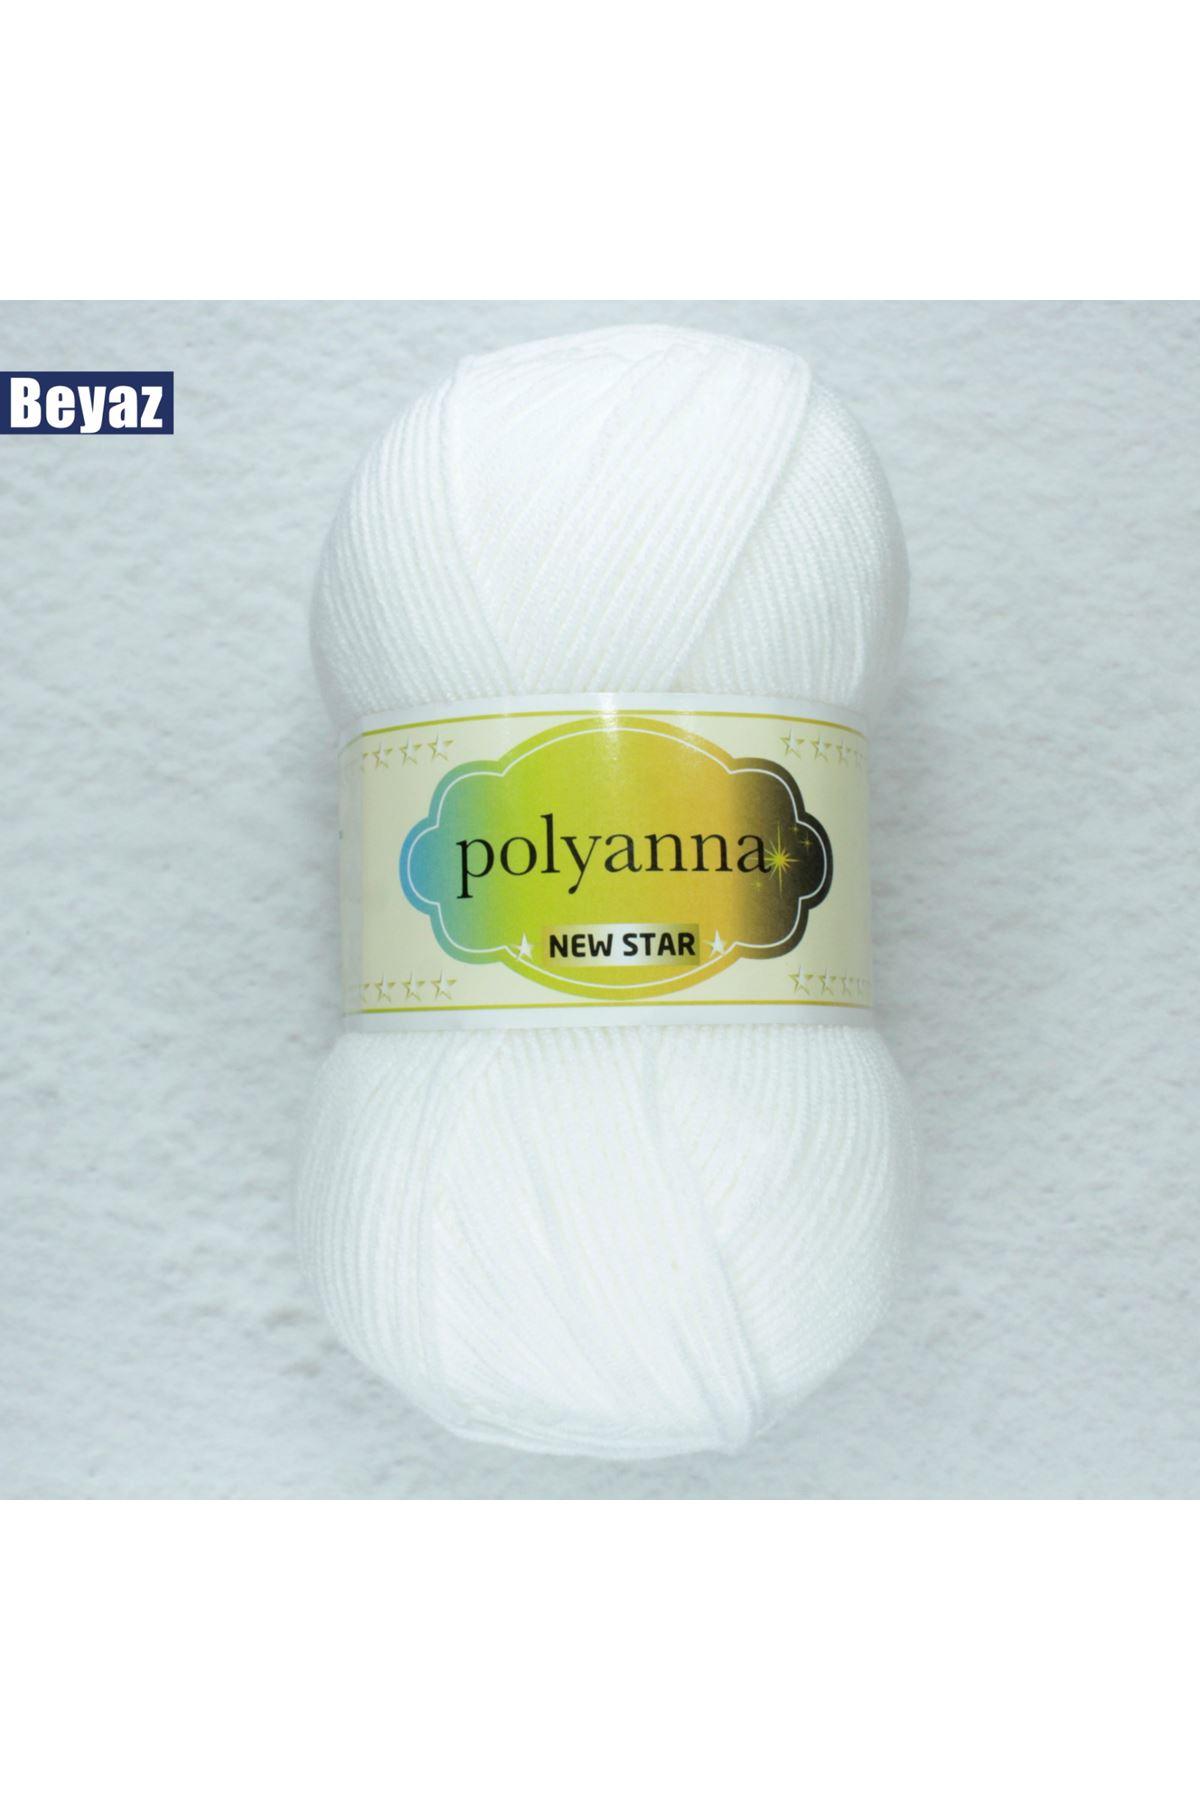 Polyanna New Star Beyaz